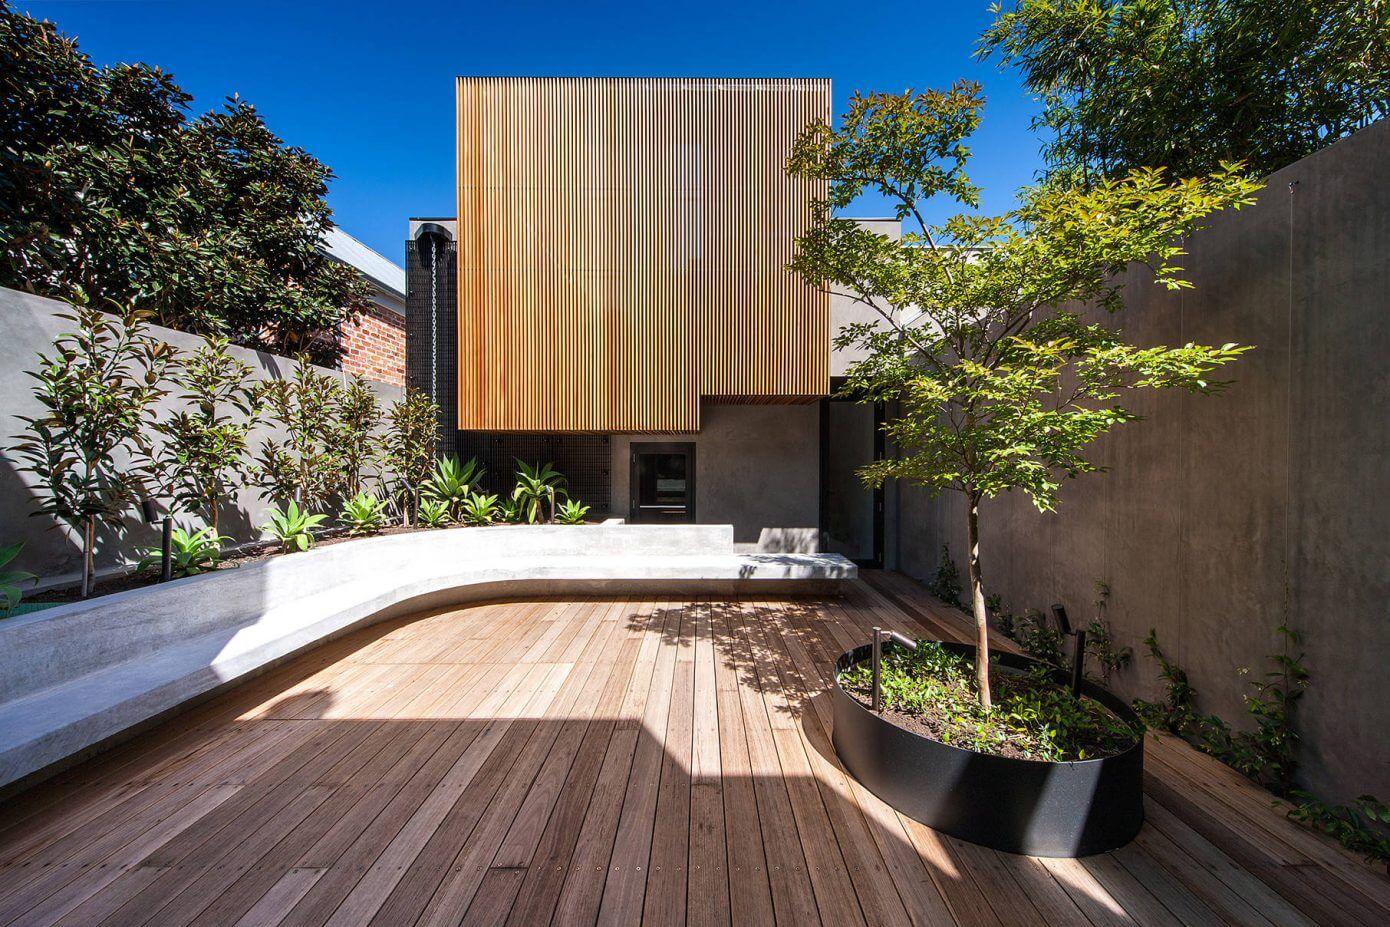 004 house melbourne nicholas murray architects homeadore. Black Bedroom Furniture Sets. Home Design Ideas